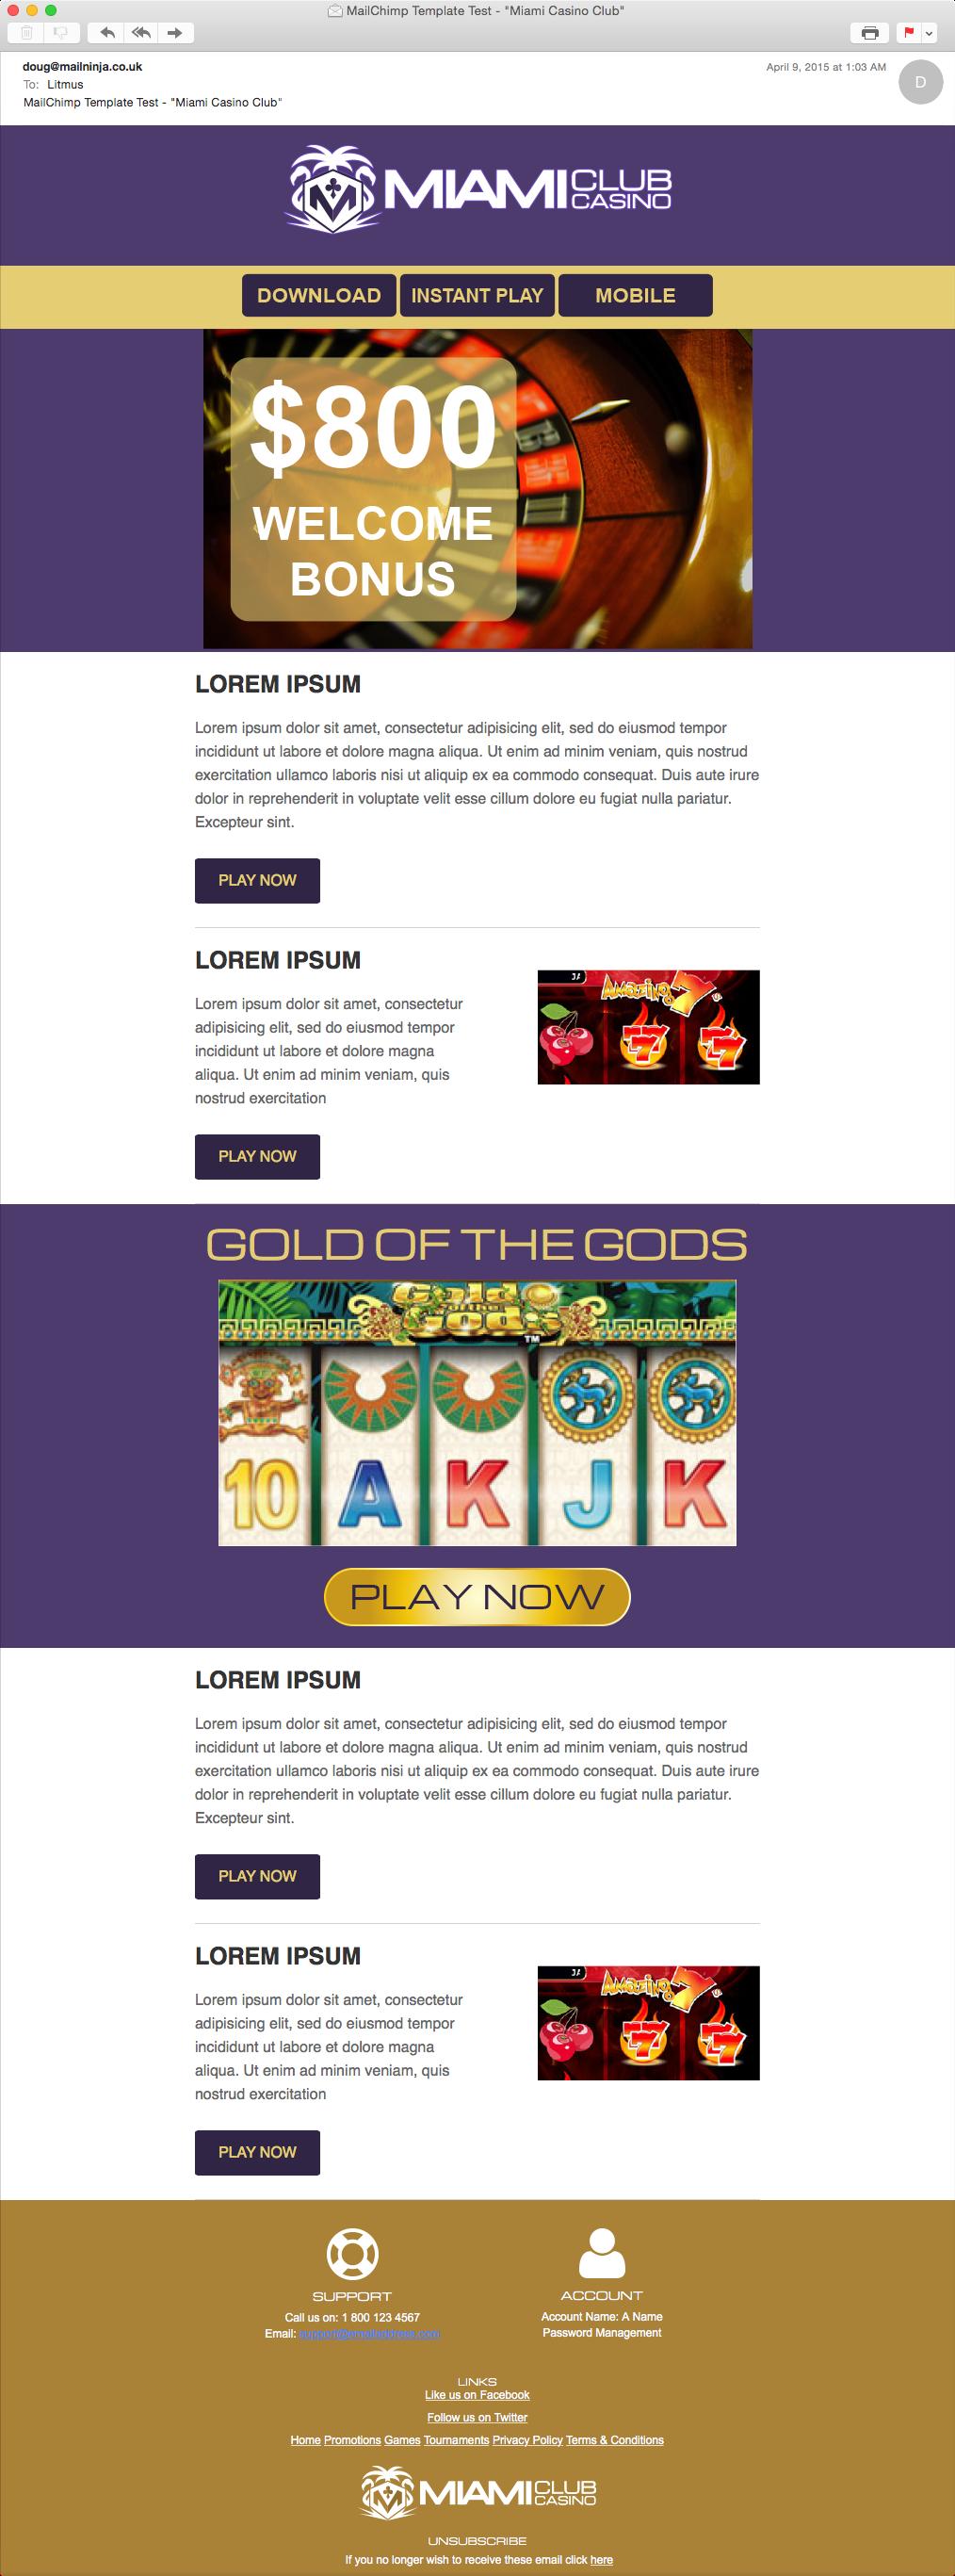 Casino email marketing sibaya casino restaurants a2a